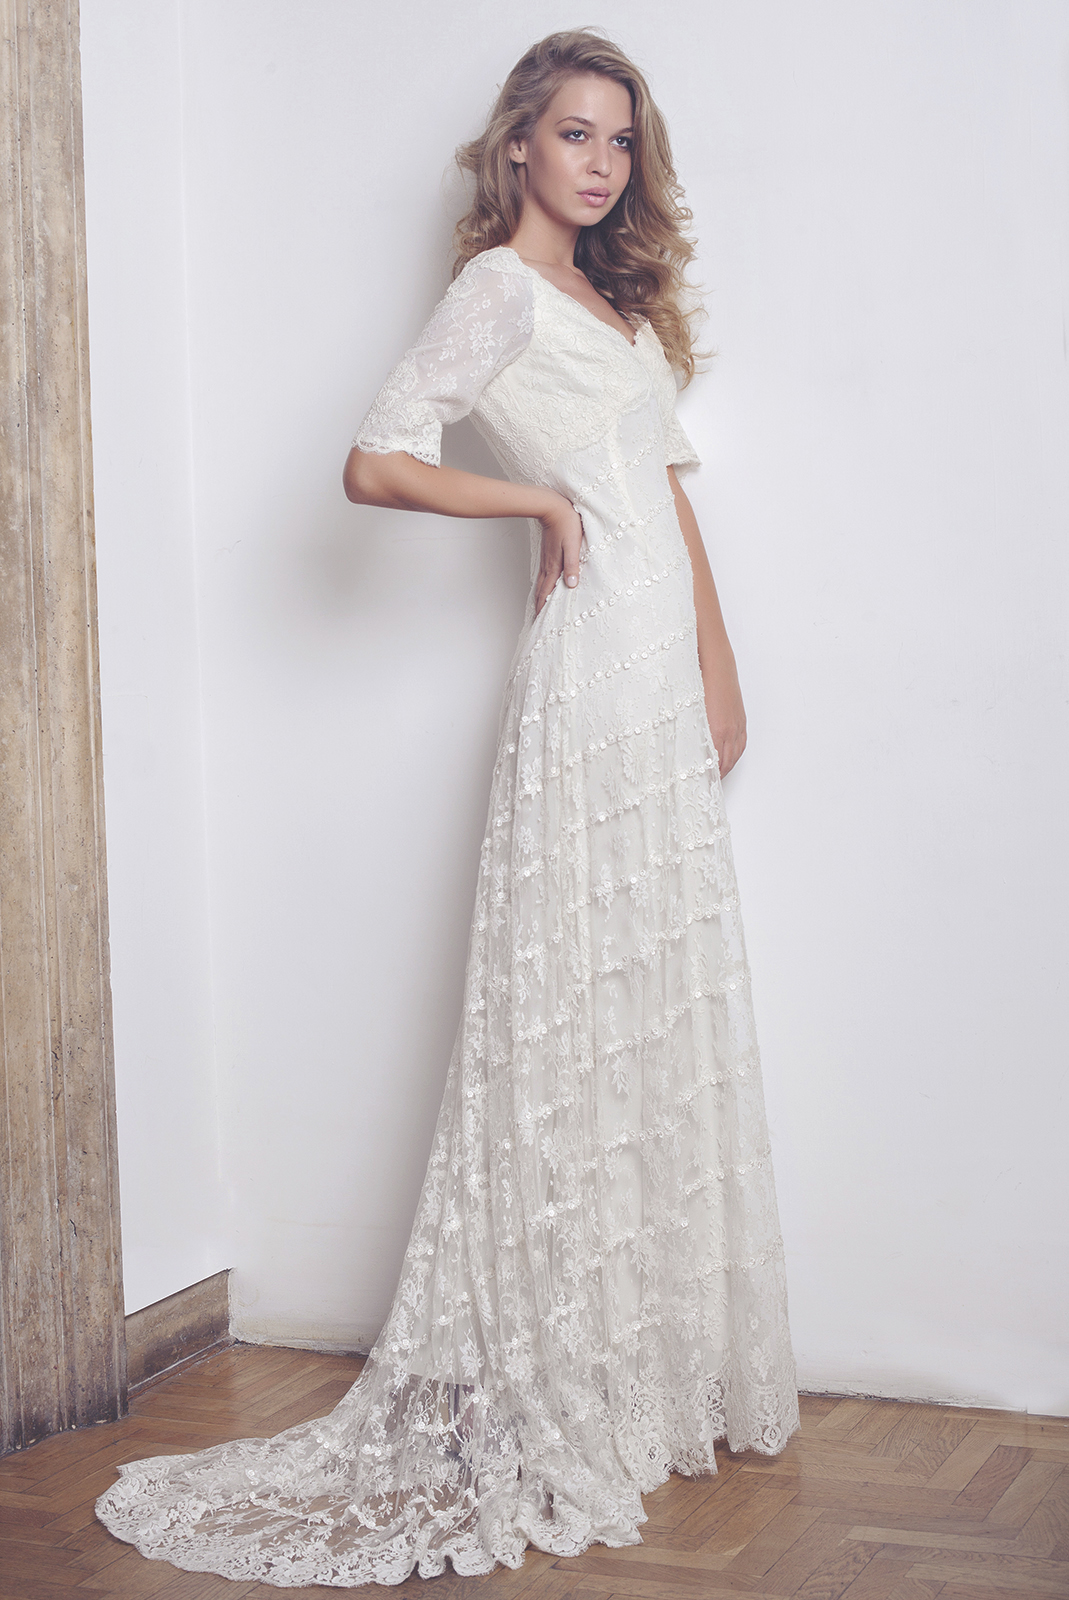 Lookbook Alessandro Mari Antonella Bridal Rossi – Photography BdeCrQxoWE